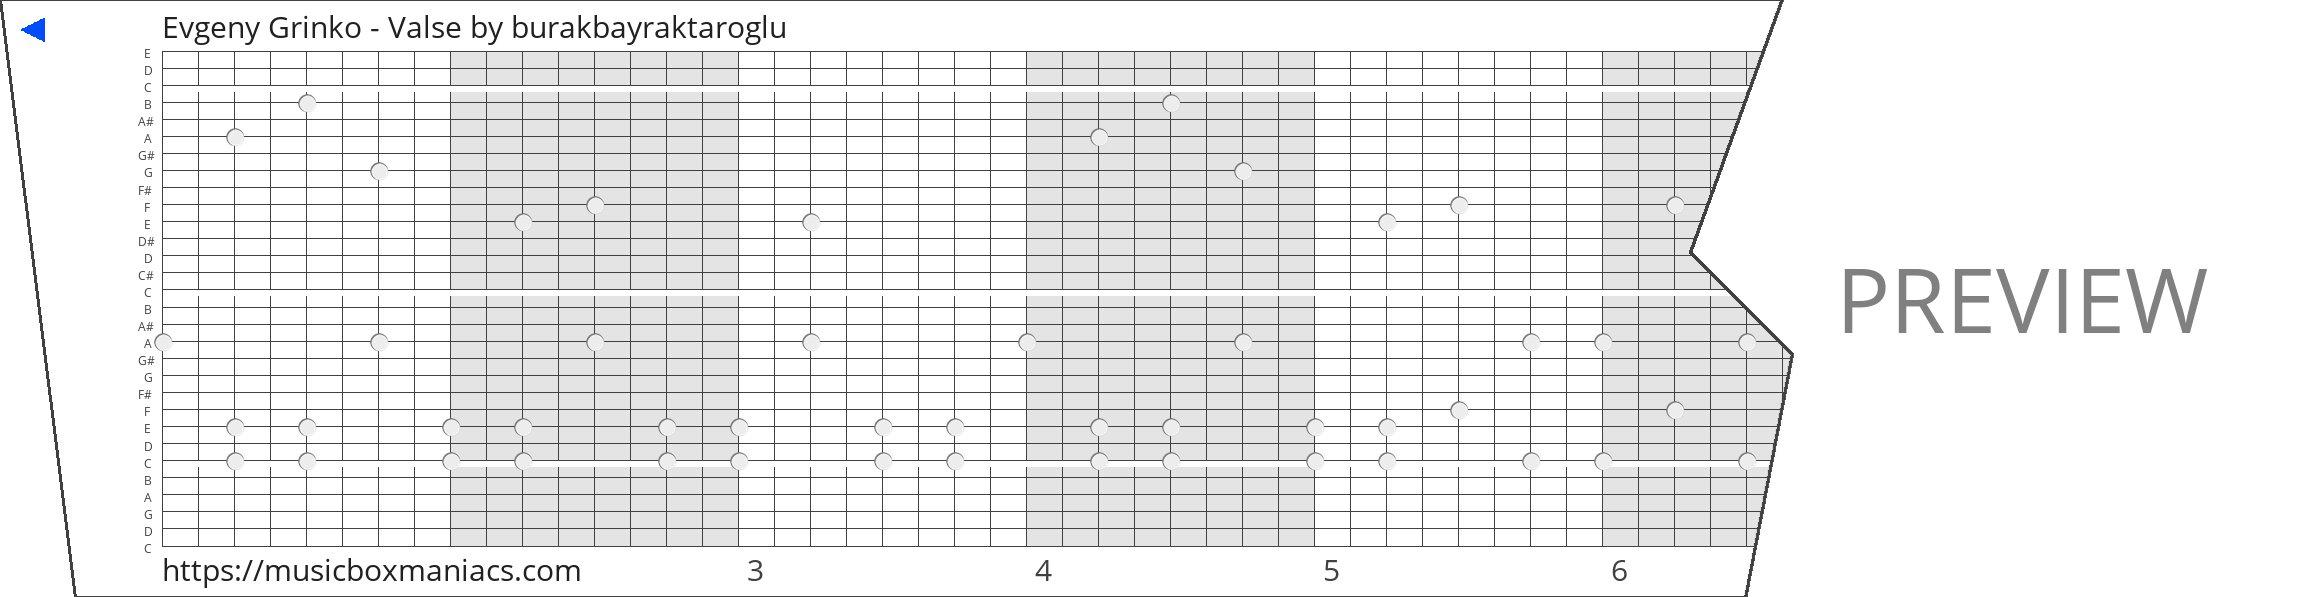 Evgeny Grinko - Valse 30 note music box paper strip